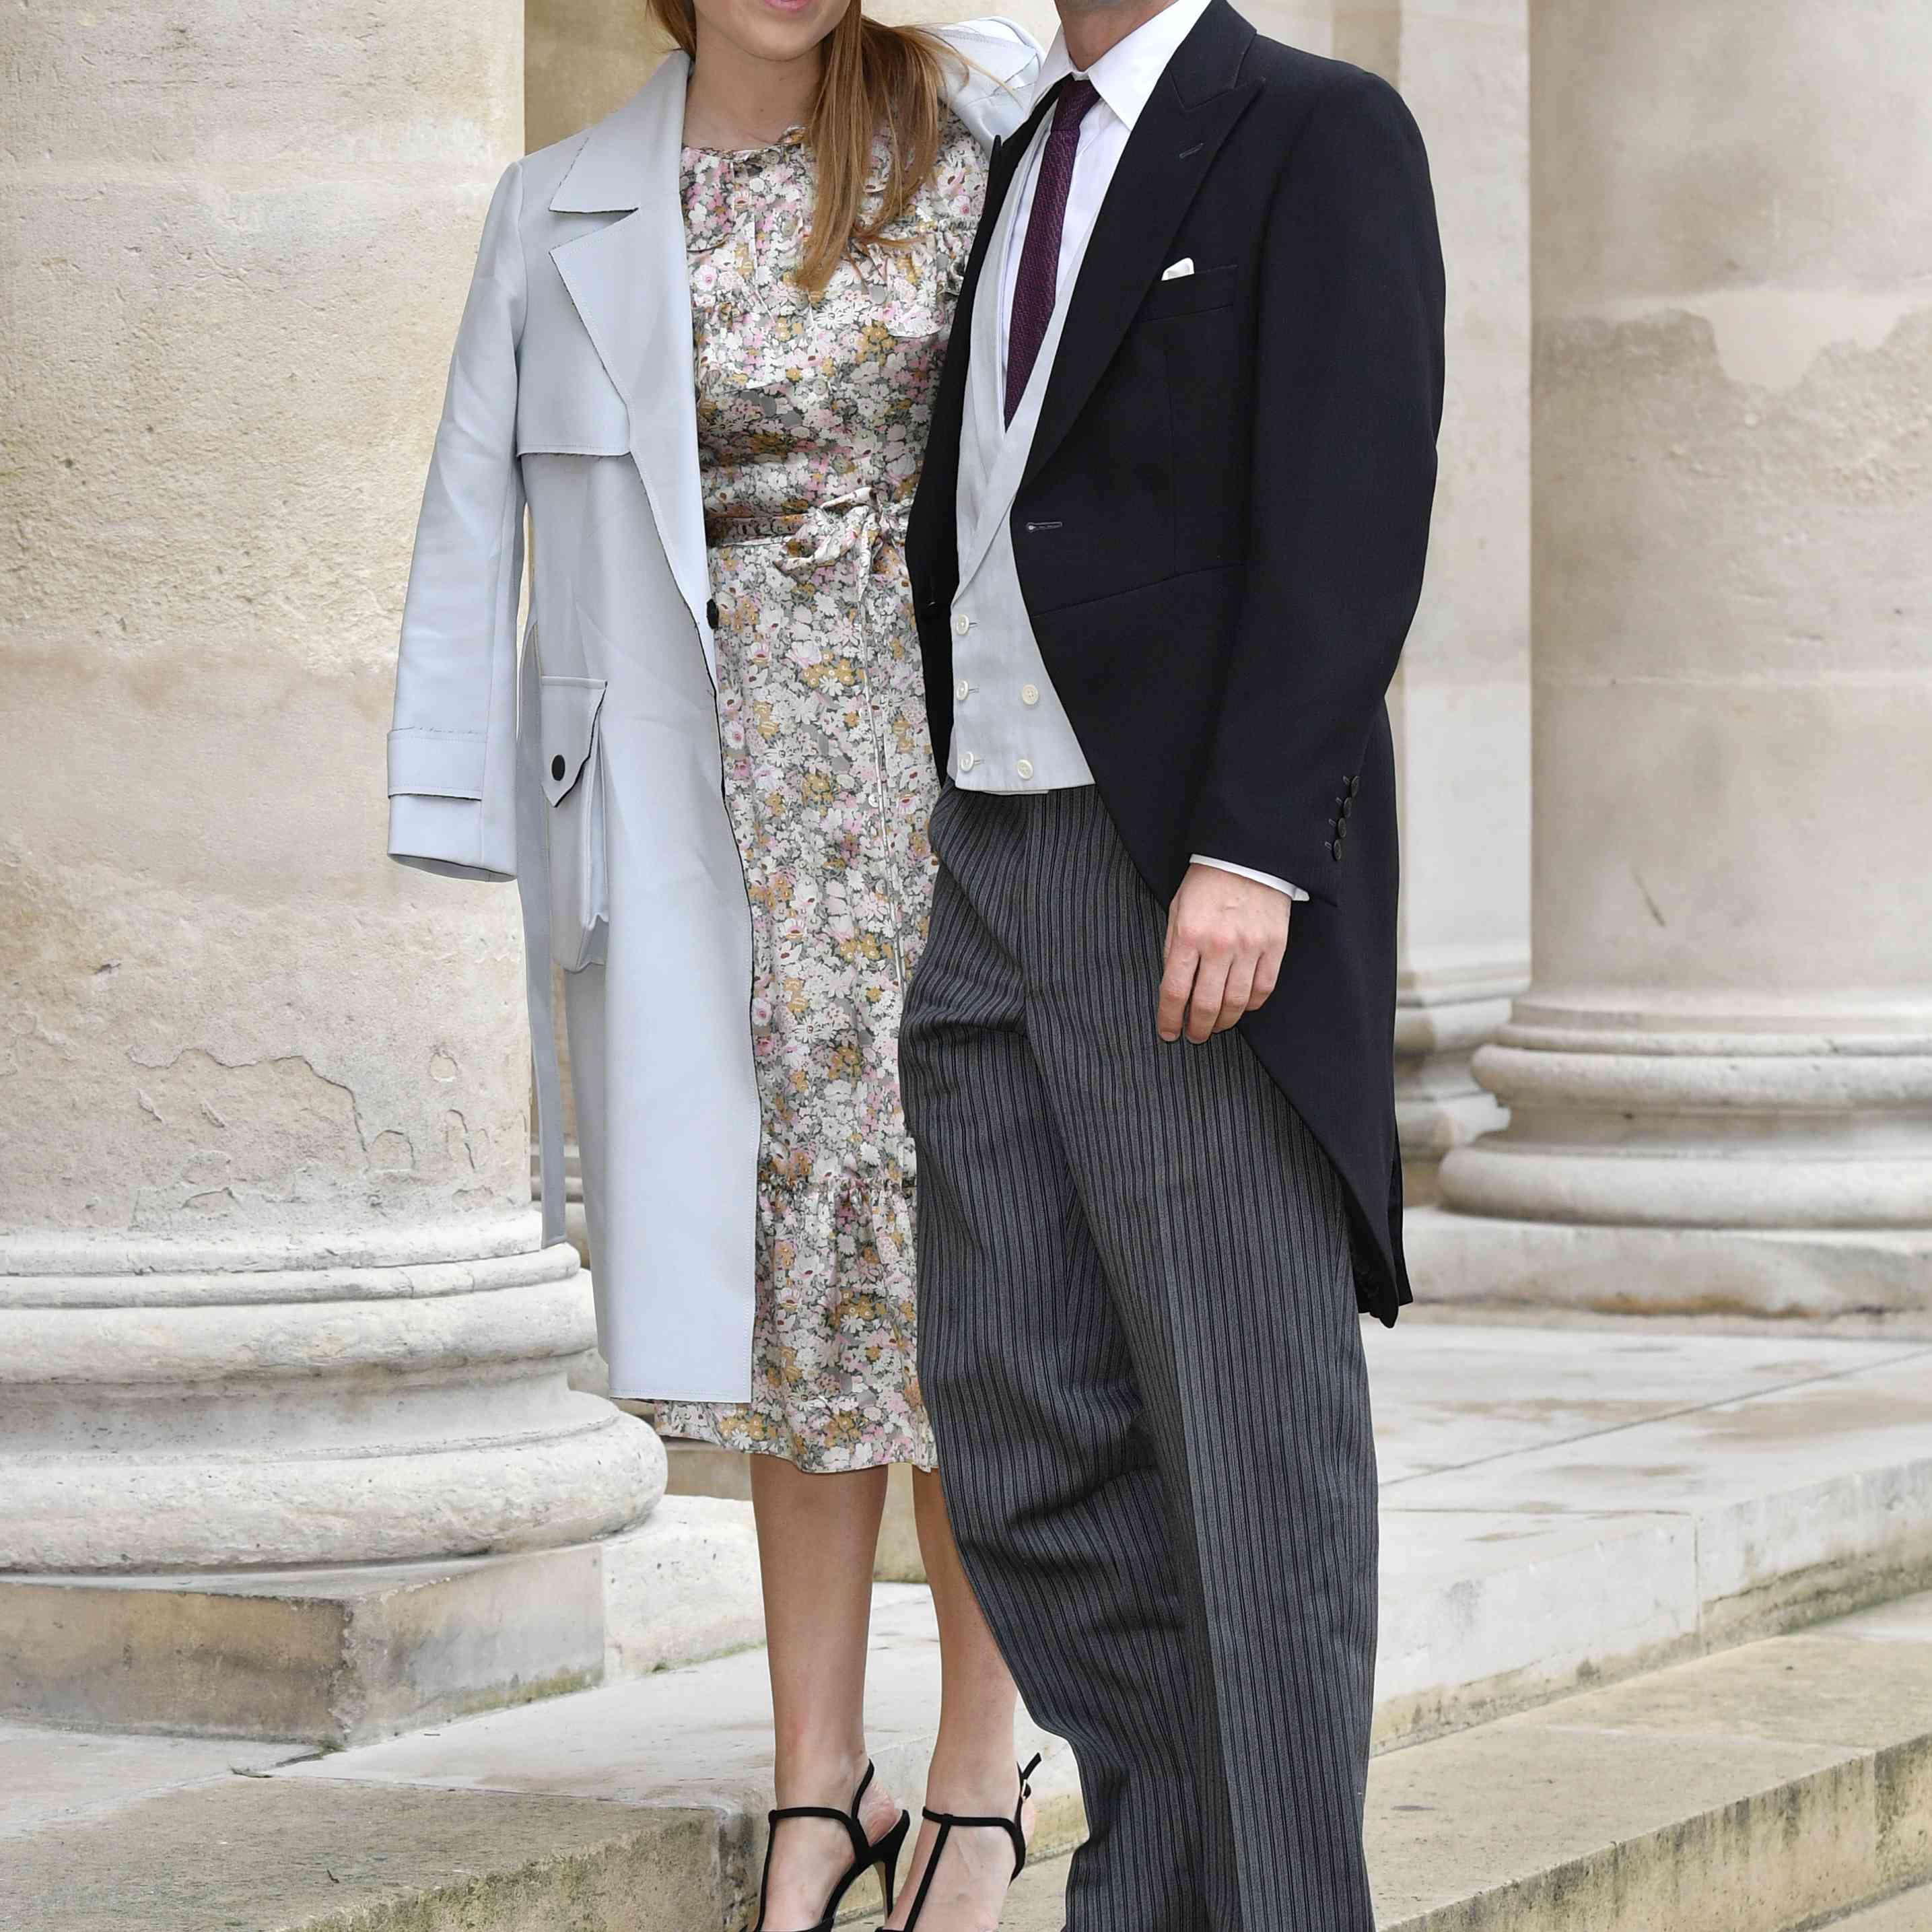 Princess Beatrice and fiancé